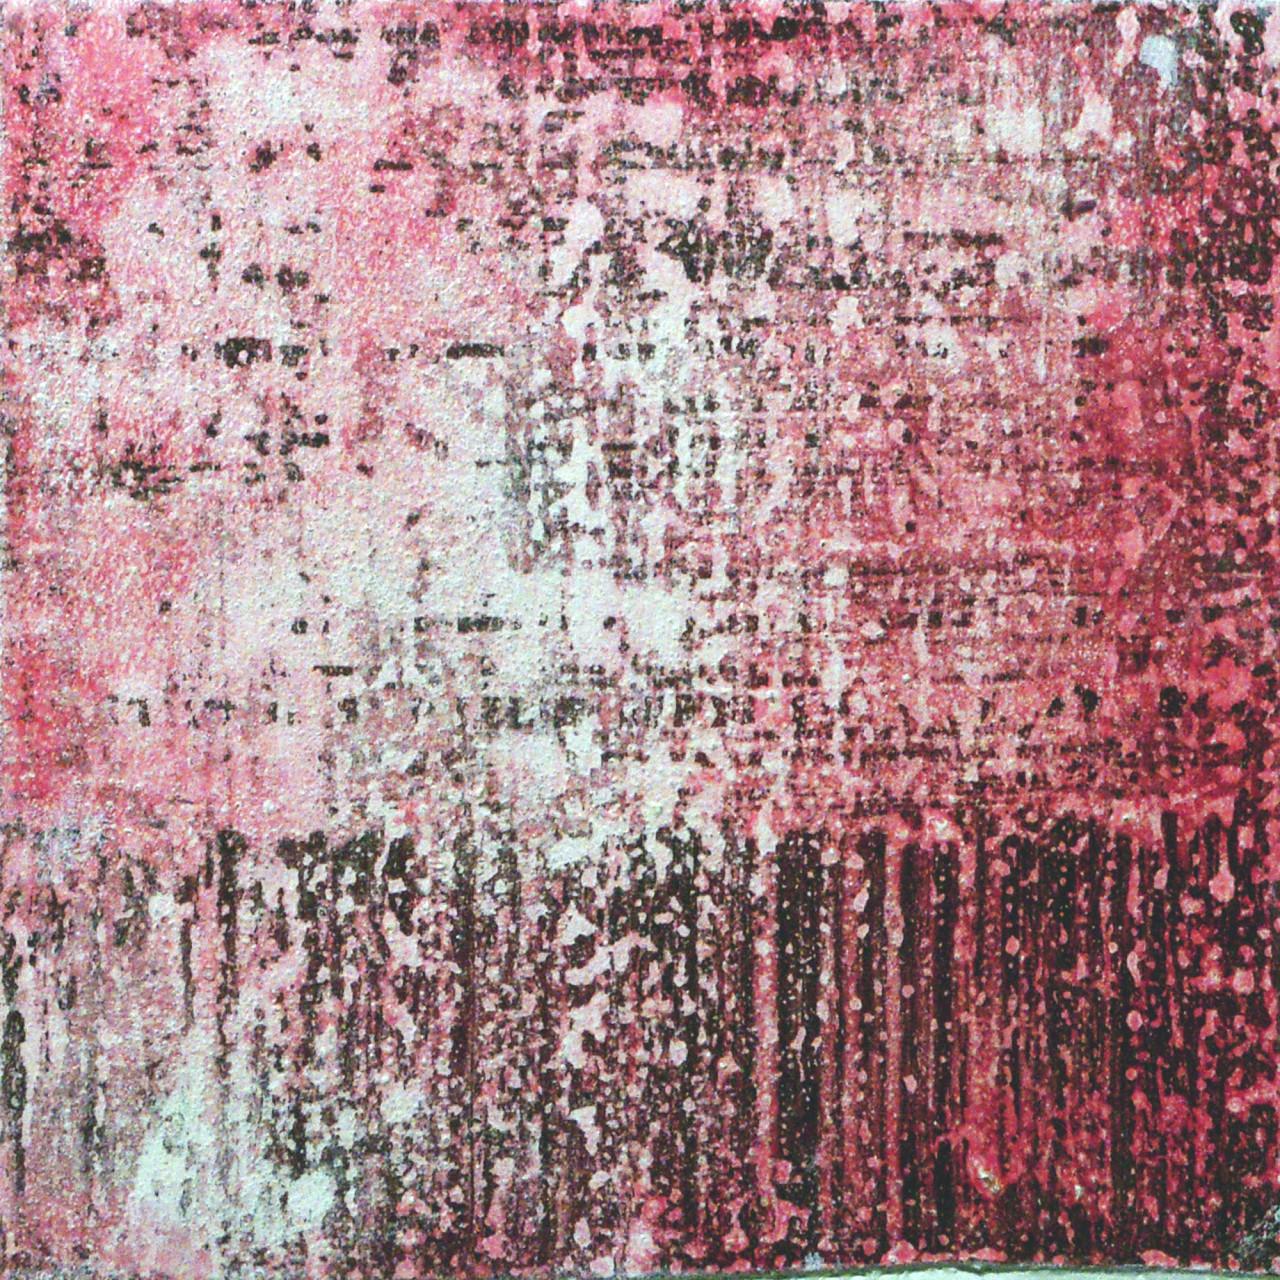 623.8, 2015 tecnica mista su tavola 23x23 cm